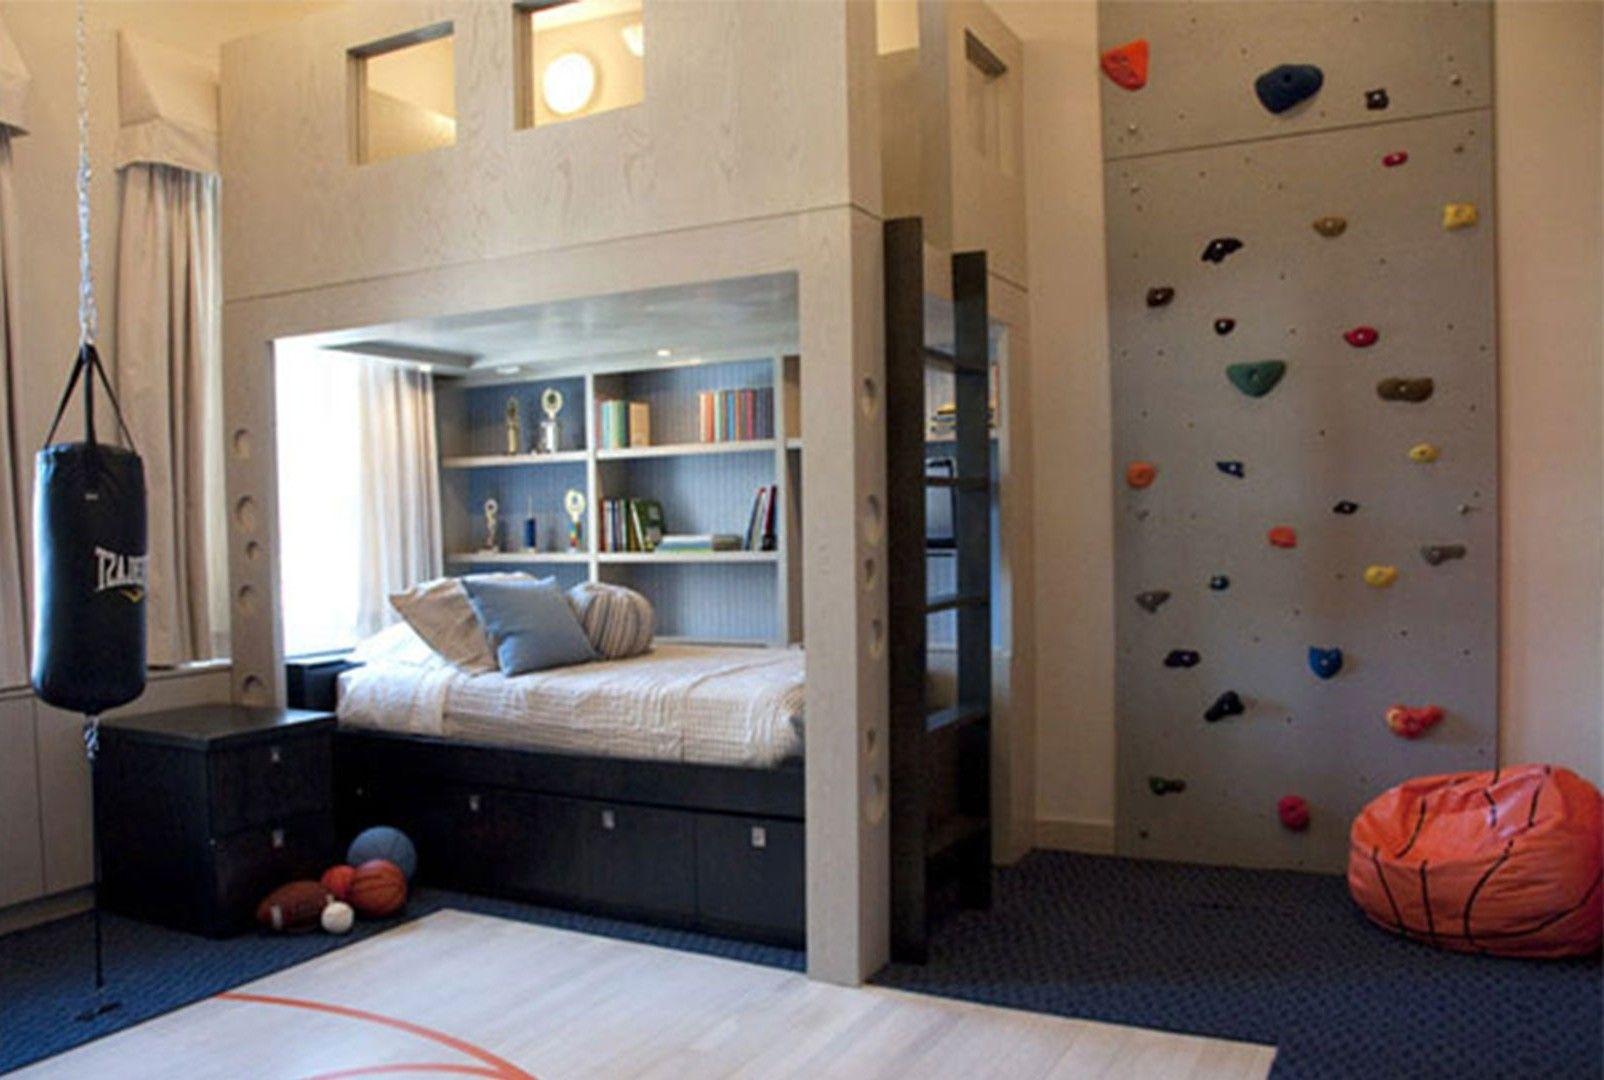 Bedroom Ideas Cool Beds Bunk Boy - Decoratorist - #227439 ...